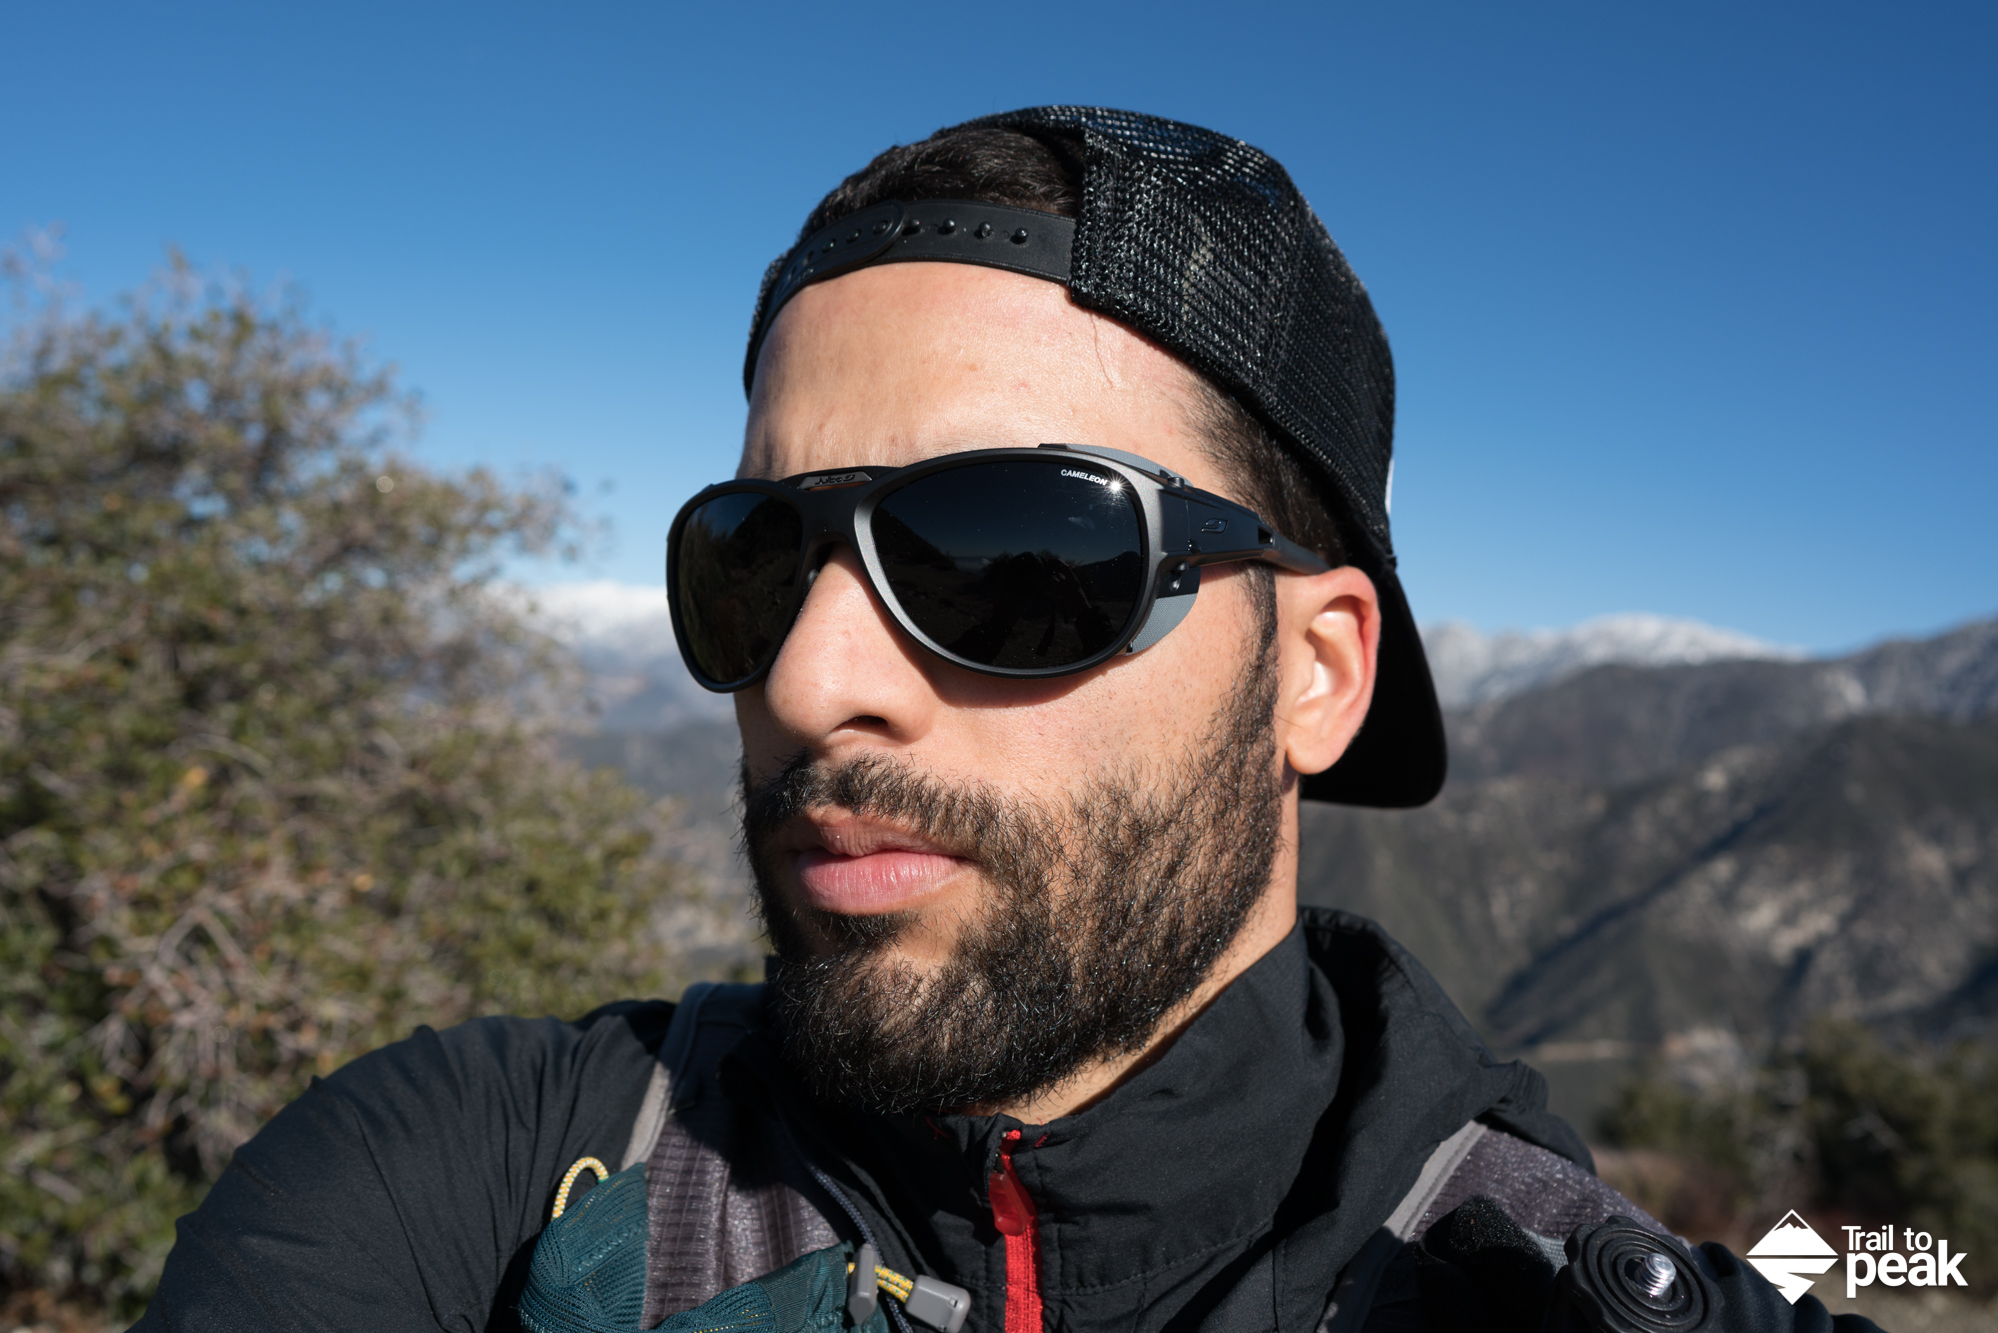 d7ef0ffbc8fc Gear Review: Julbo Explorer 2.0 Sunglasses With Camel Lenses - Trail ...